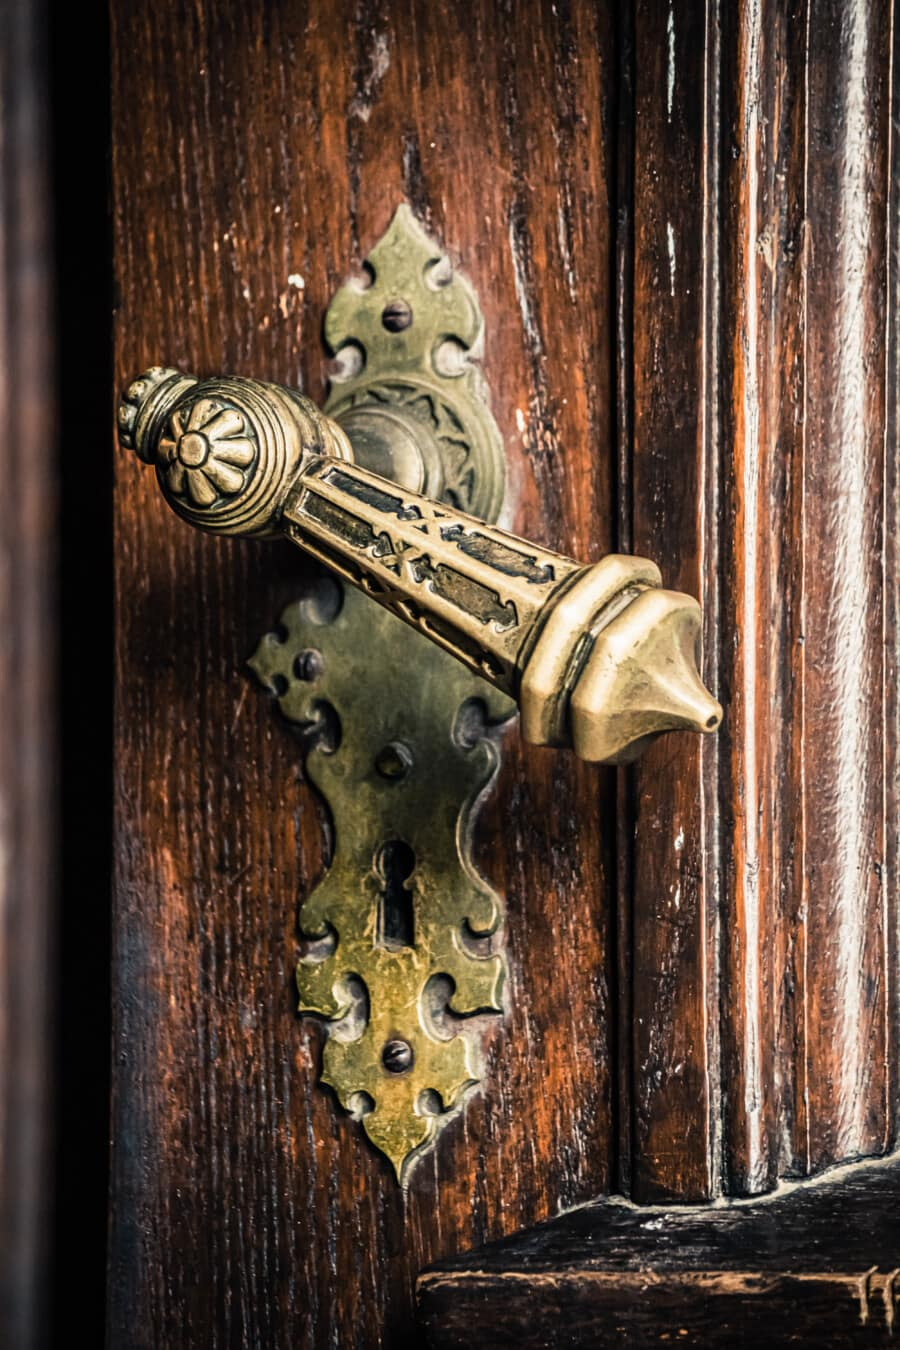 baroque, brass, decoration, front door, handmade, entrance, wood, device, fastener, metal